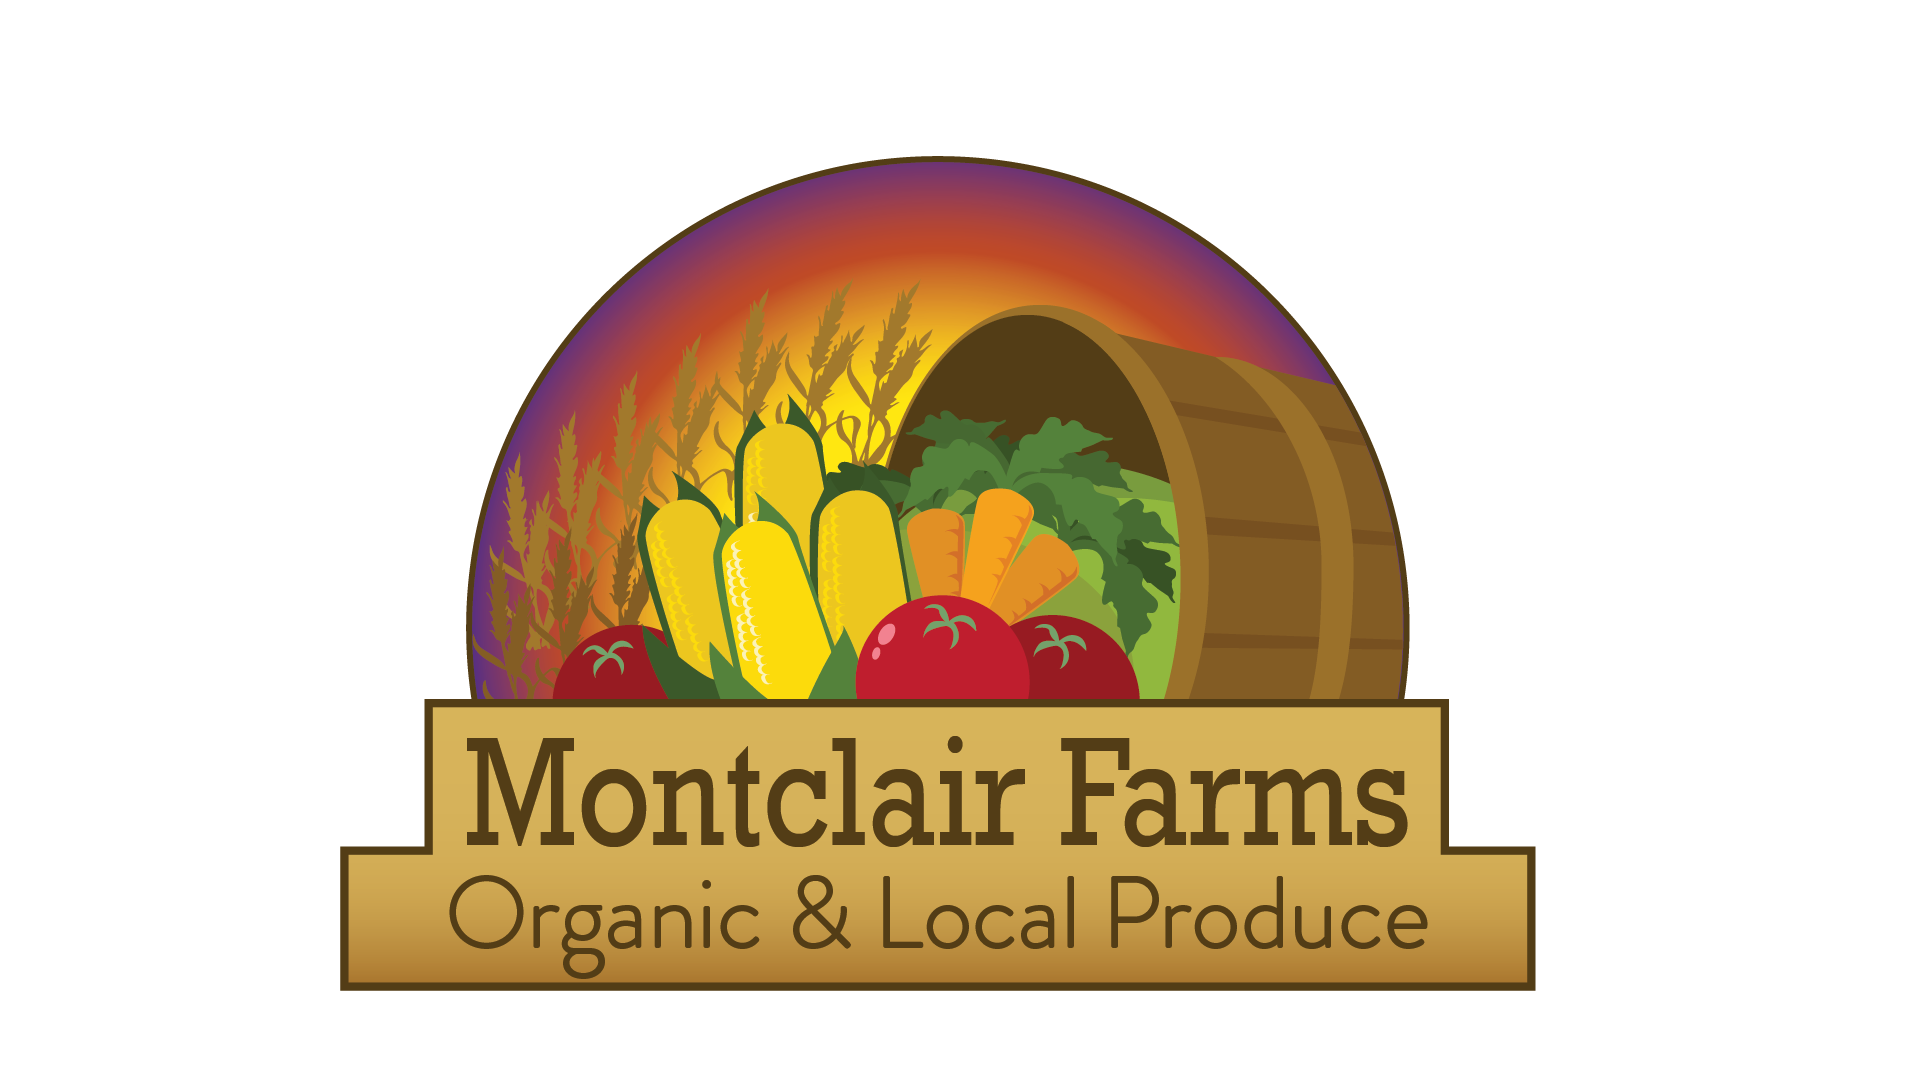 MontclairFarm_Logo_FInal-01.png